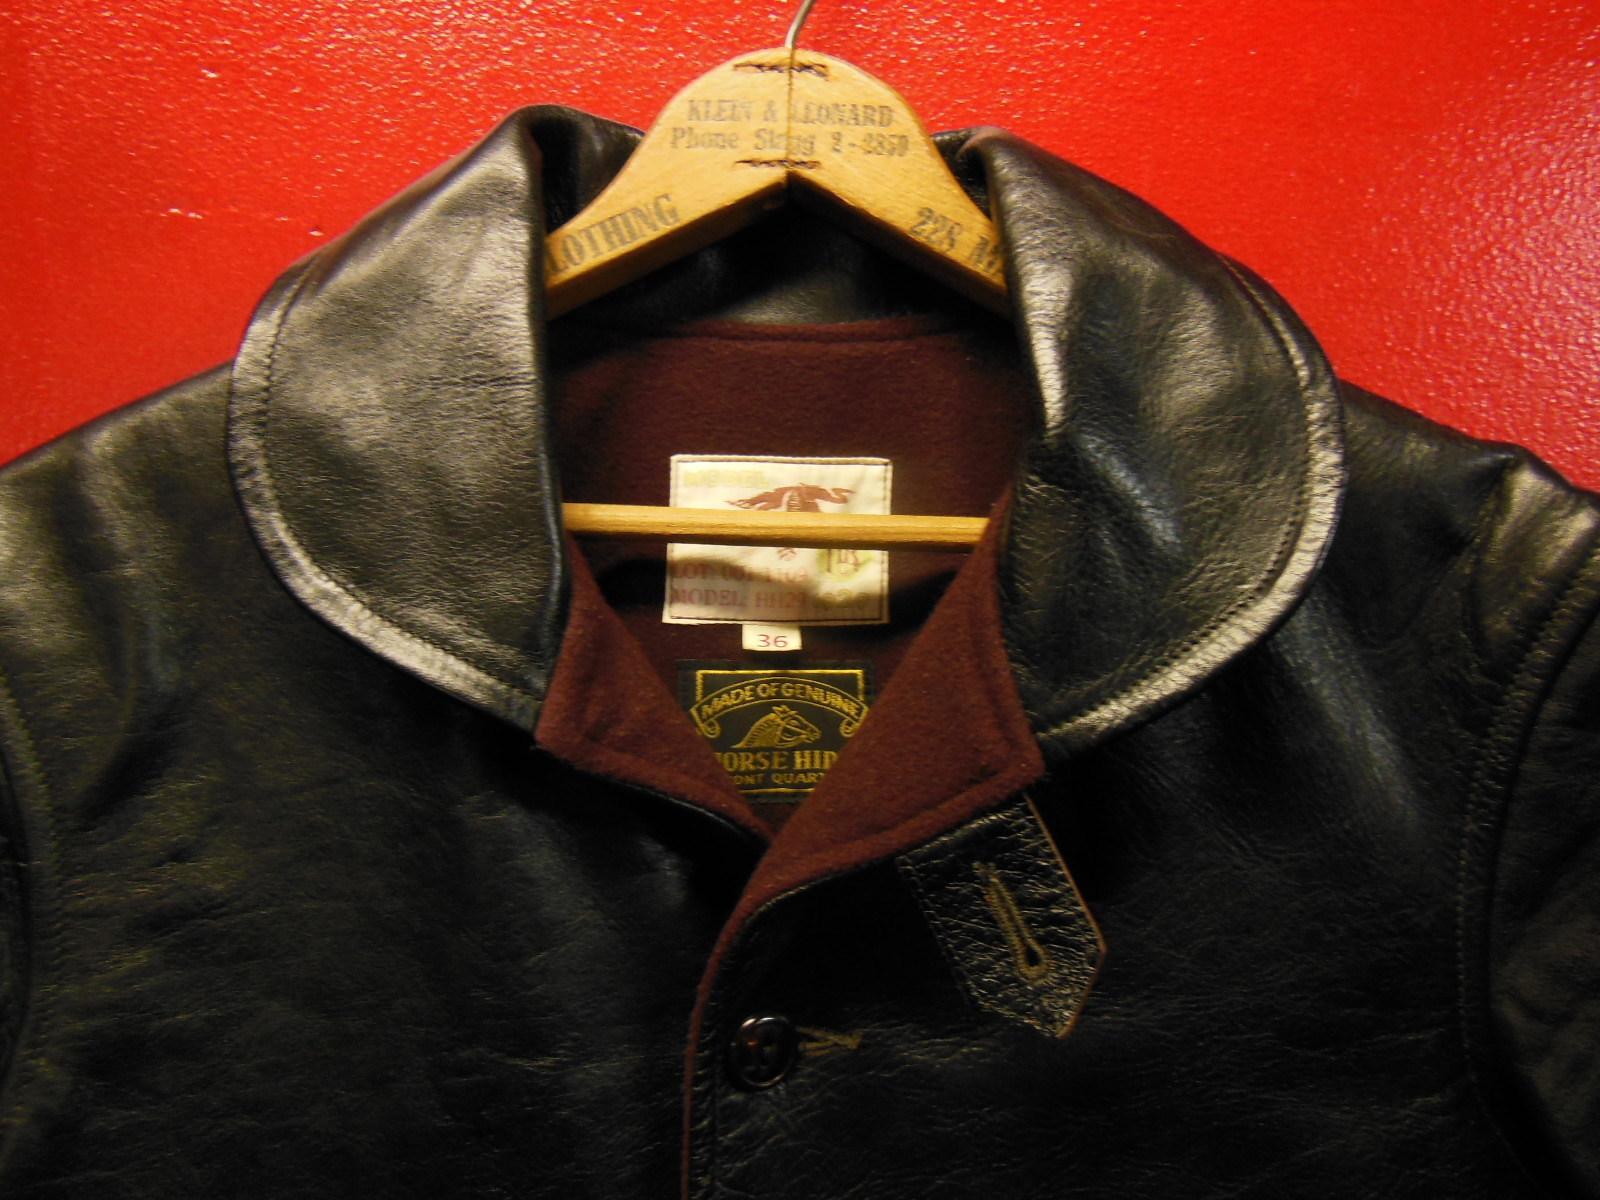 USED HIMEL BROTHERS LEATHER HERON 1929/新喜皮革製黒ホースハイド/SIZE-36/ボタンフロント A-1 ジャケット_c0187684_14583052.jpg